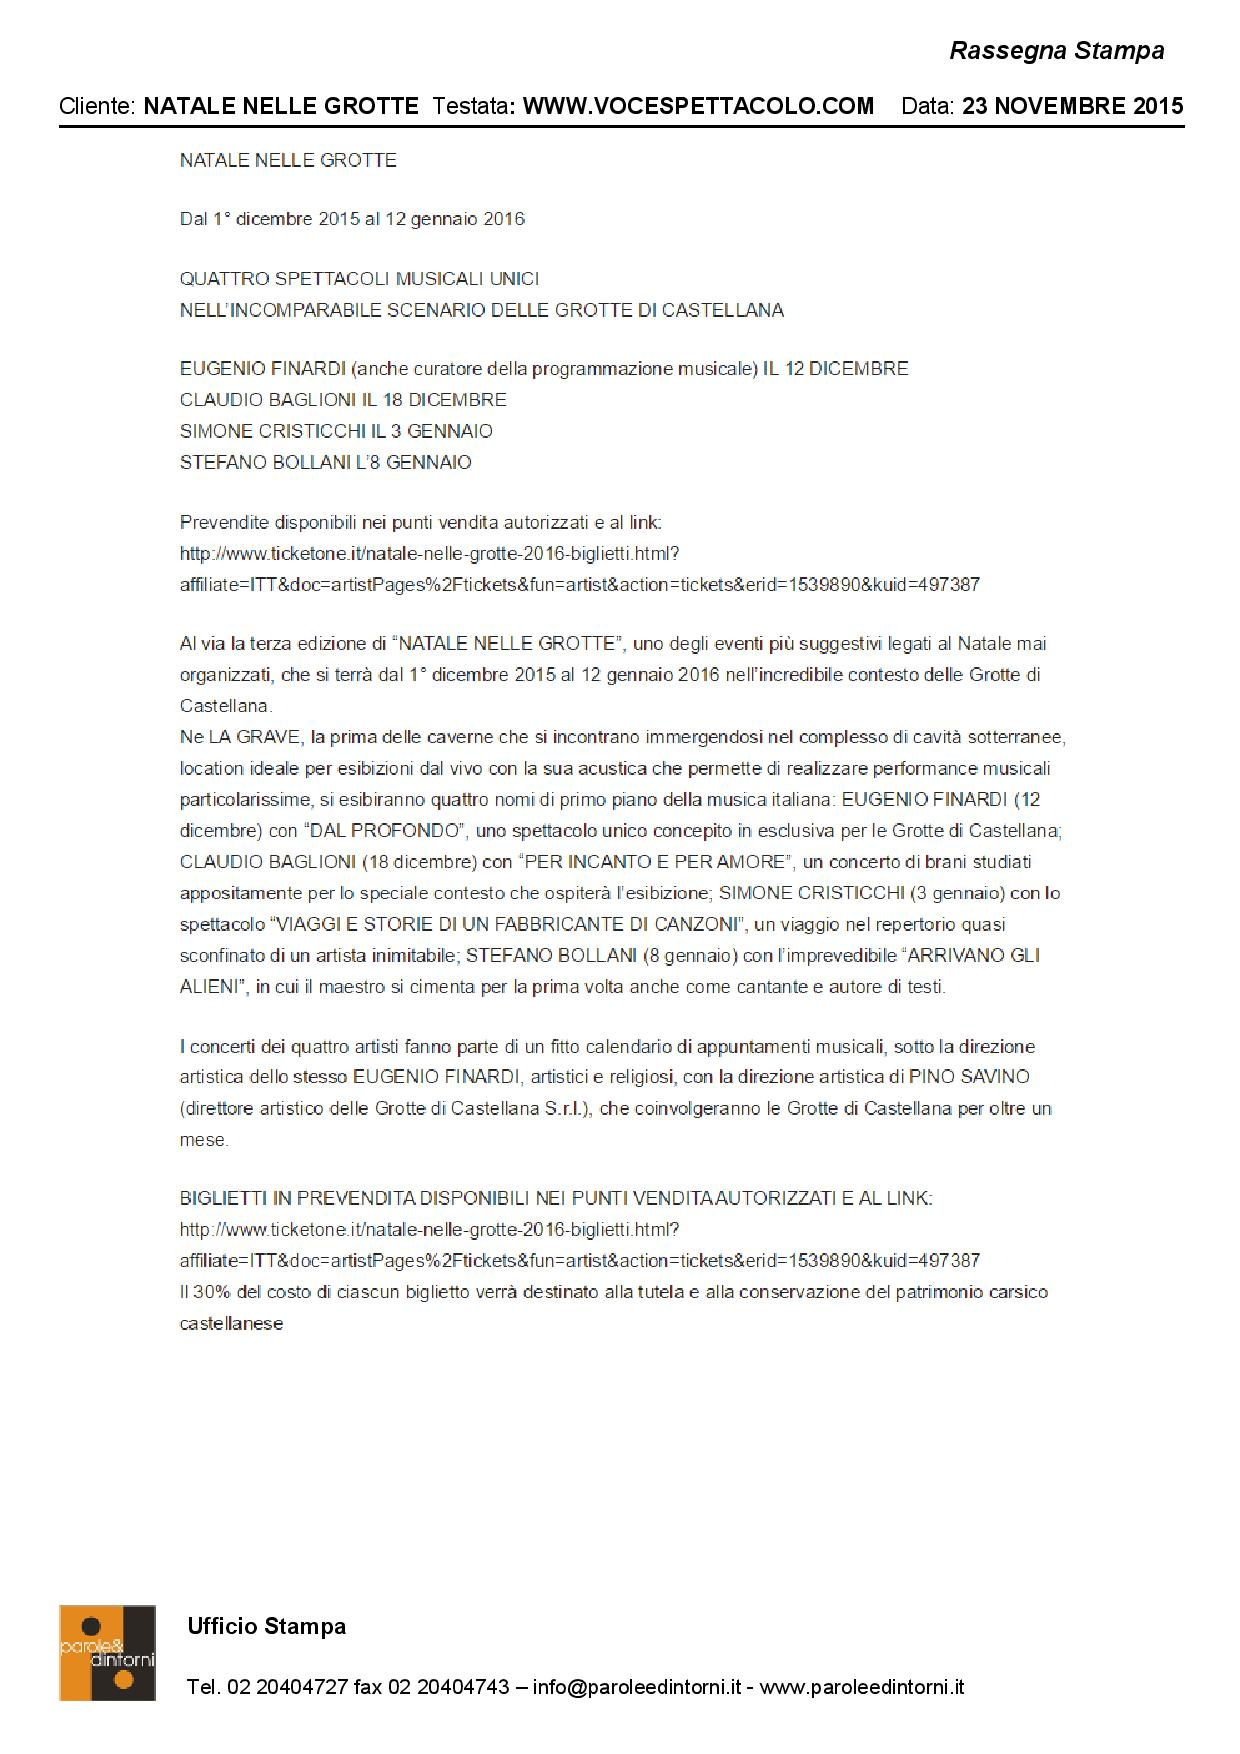 20151123_www.vocespettacolo.com_Natale nelle Grotte-page-002